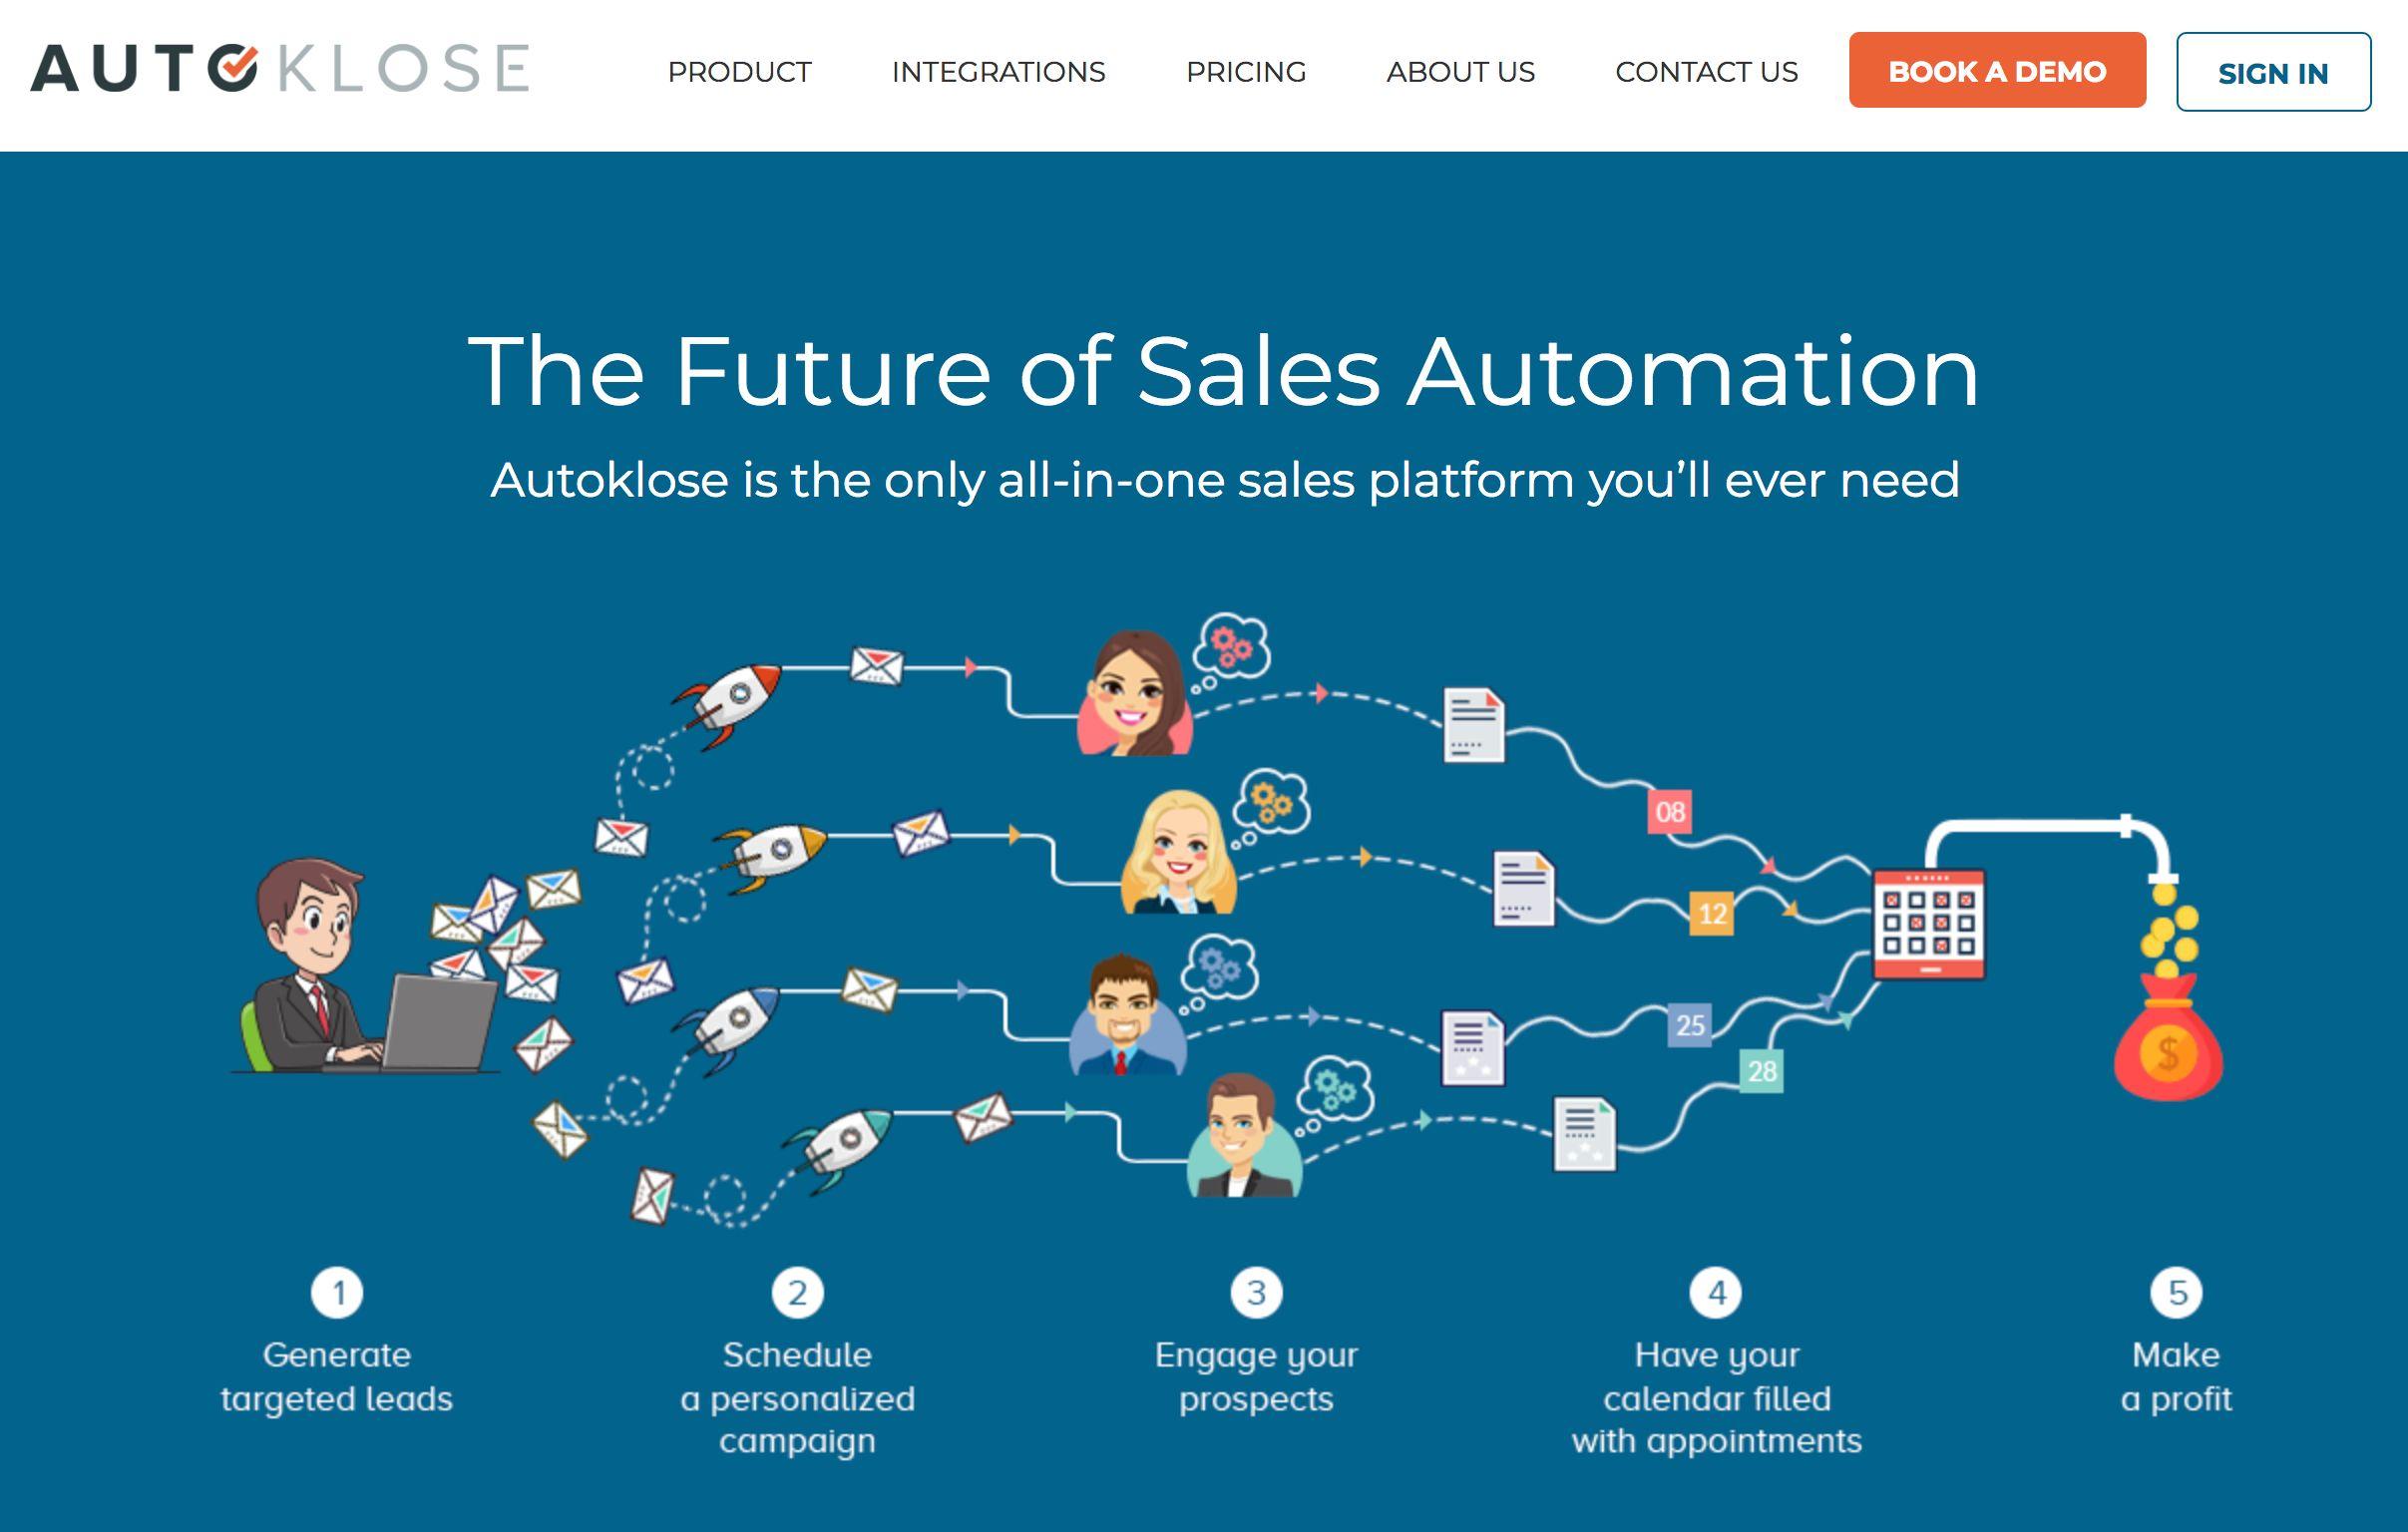 Autoklose home page